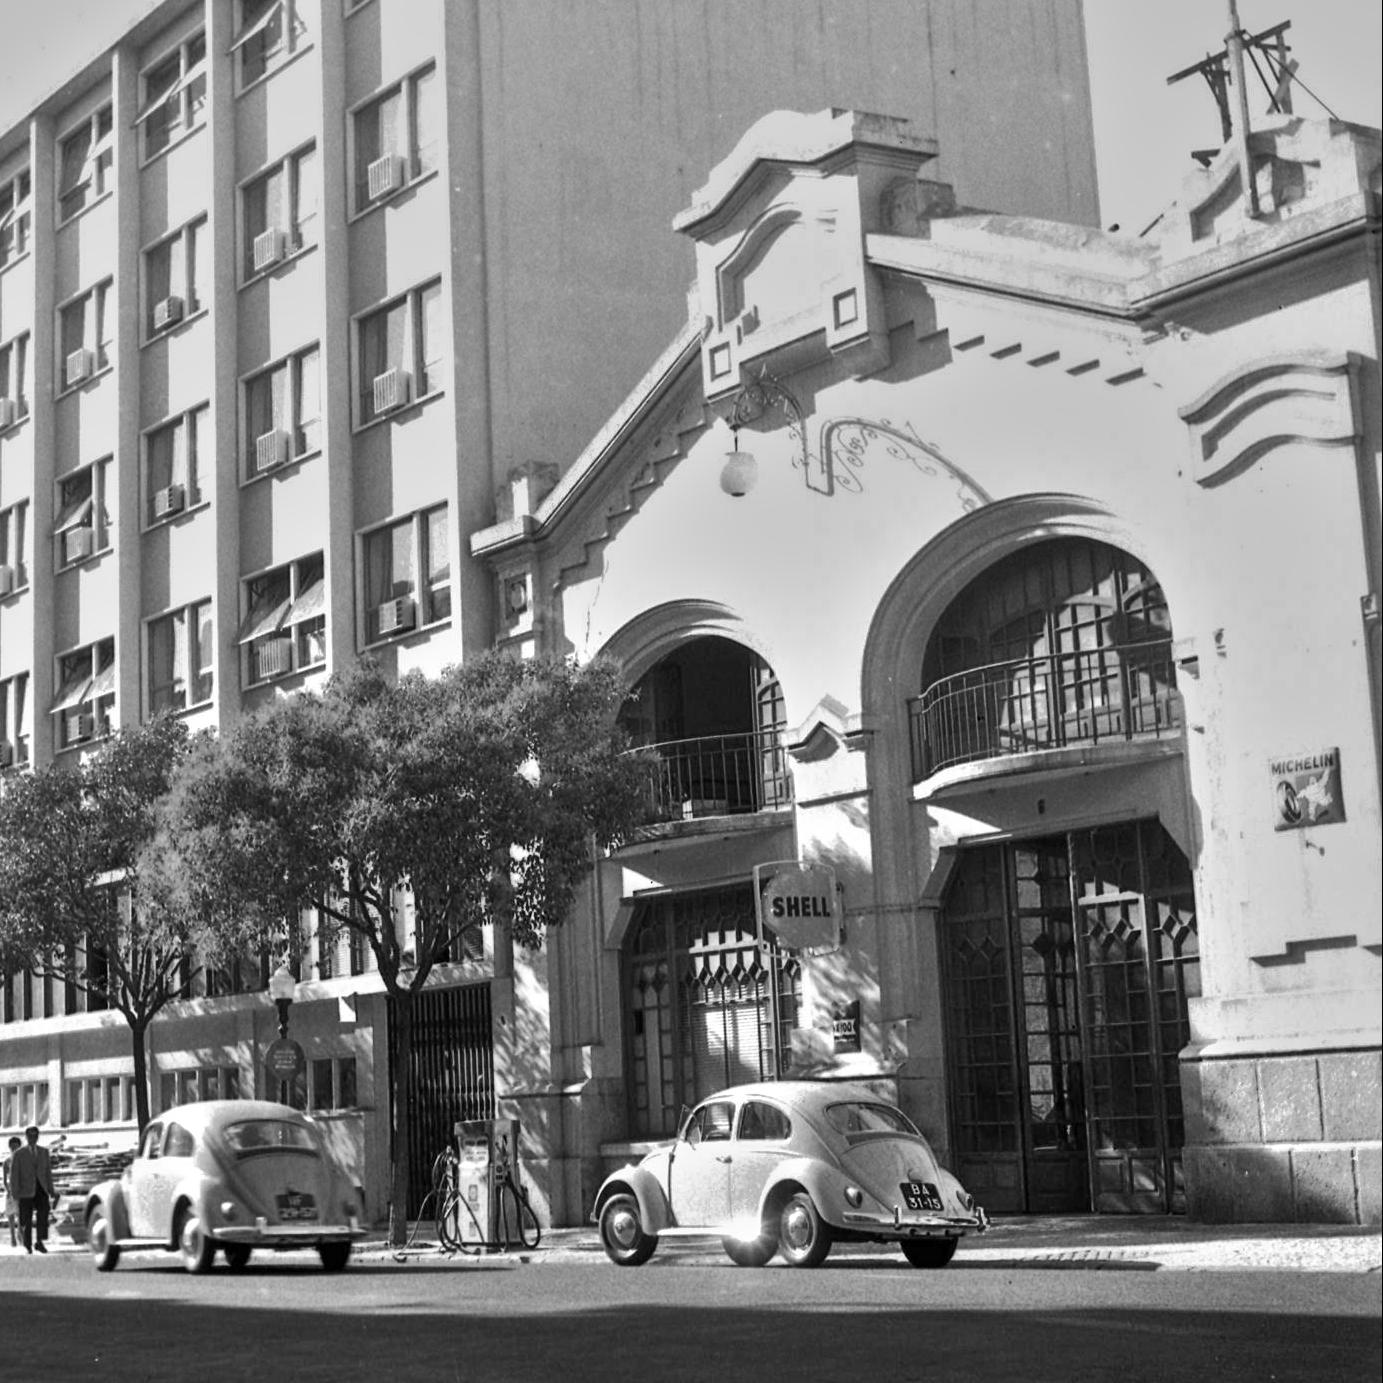 Shell, Rua Andrade Corvo (A.J. Fernandes, 1961)